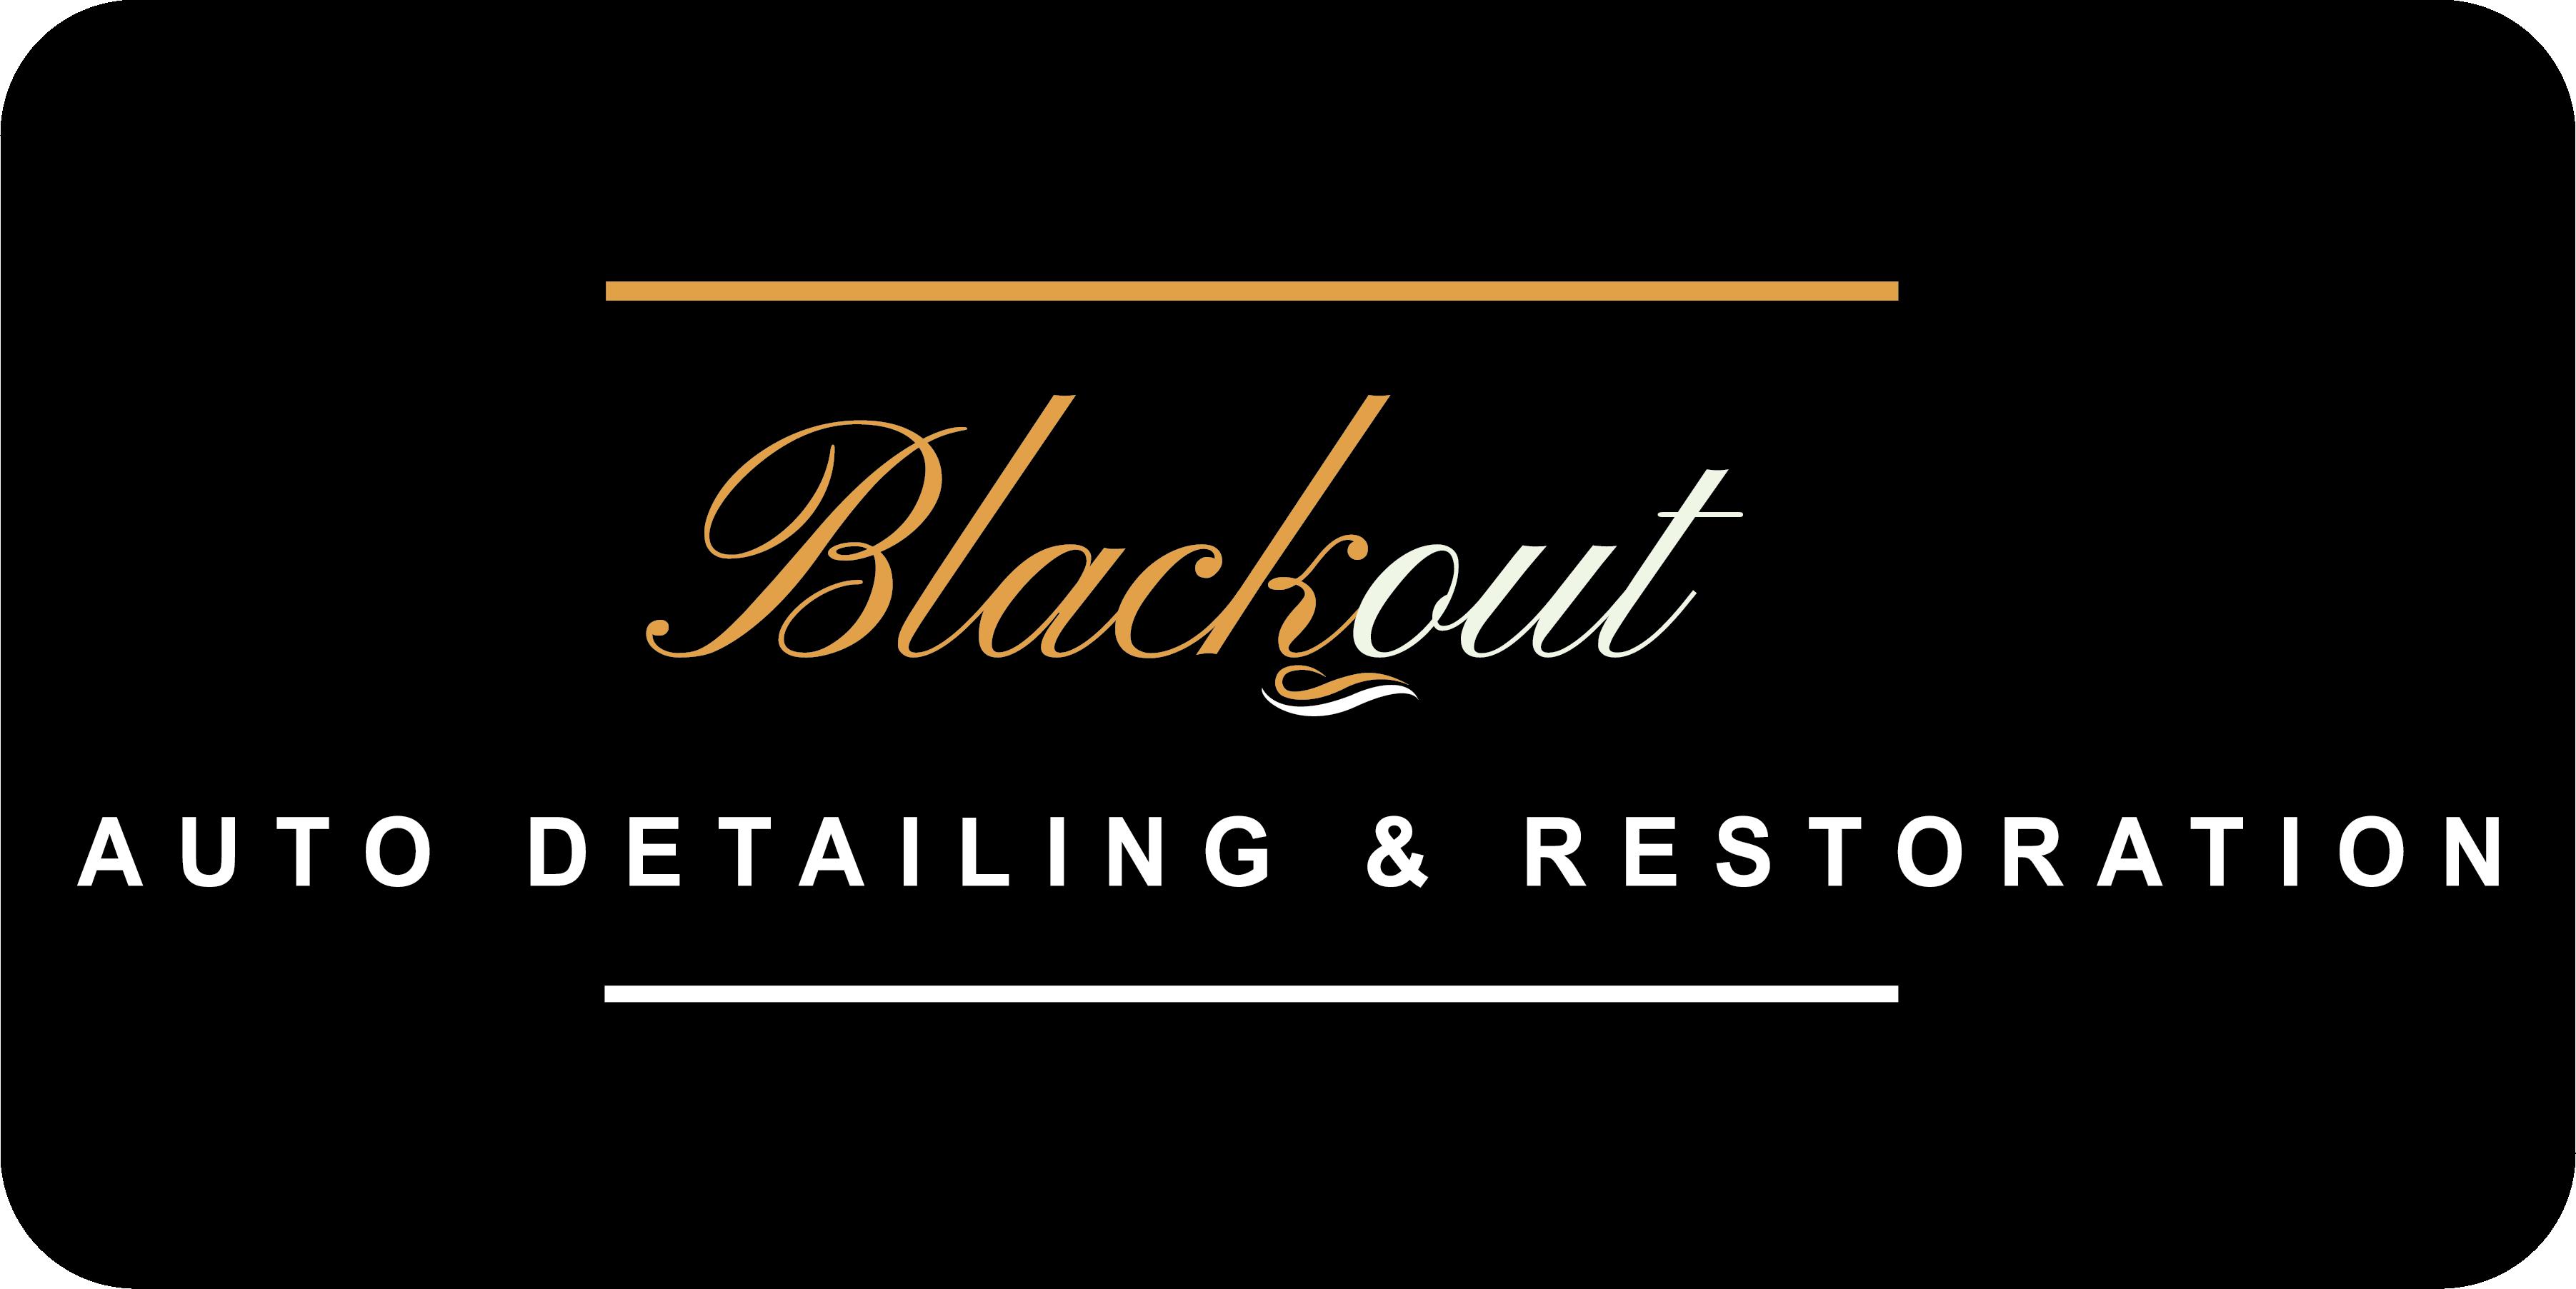 Blackout Auto Detailing and Restoration